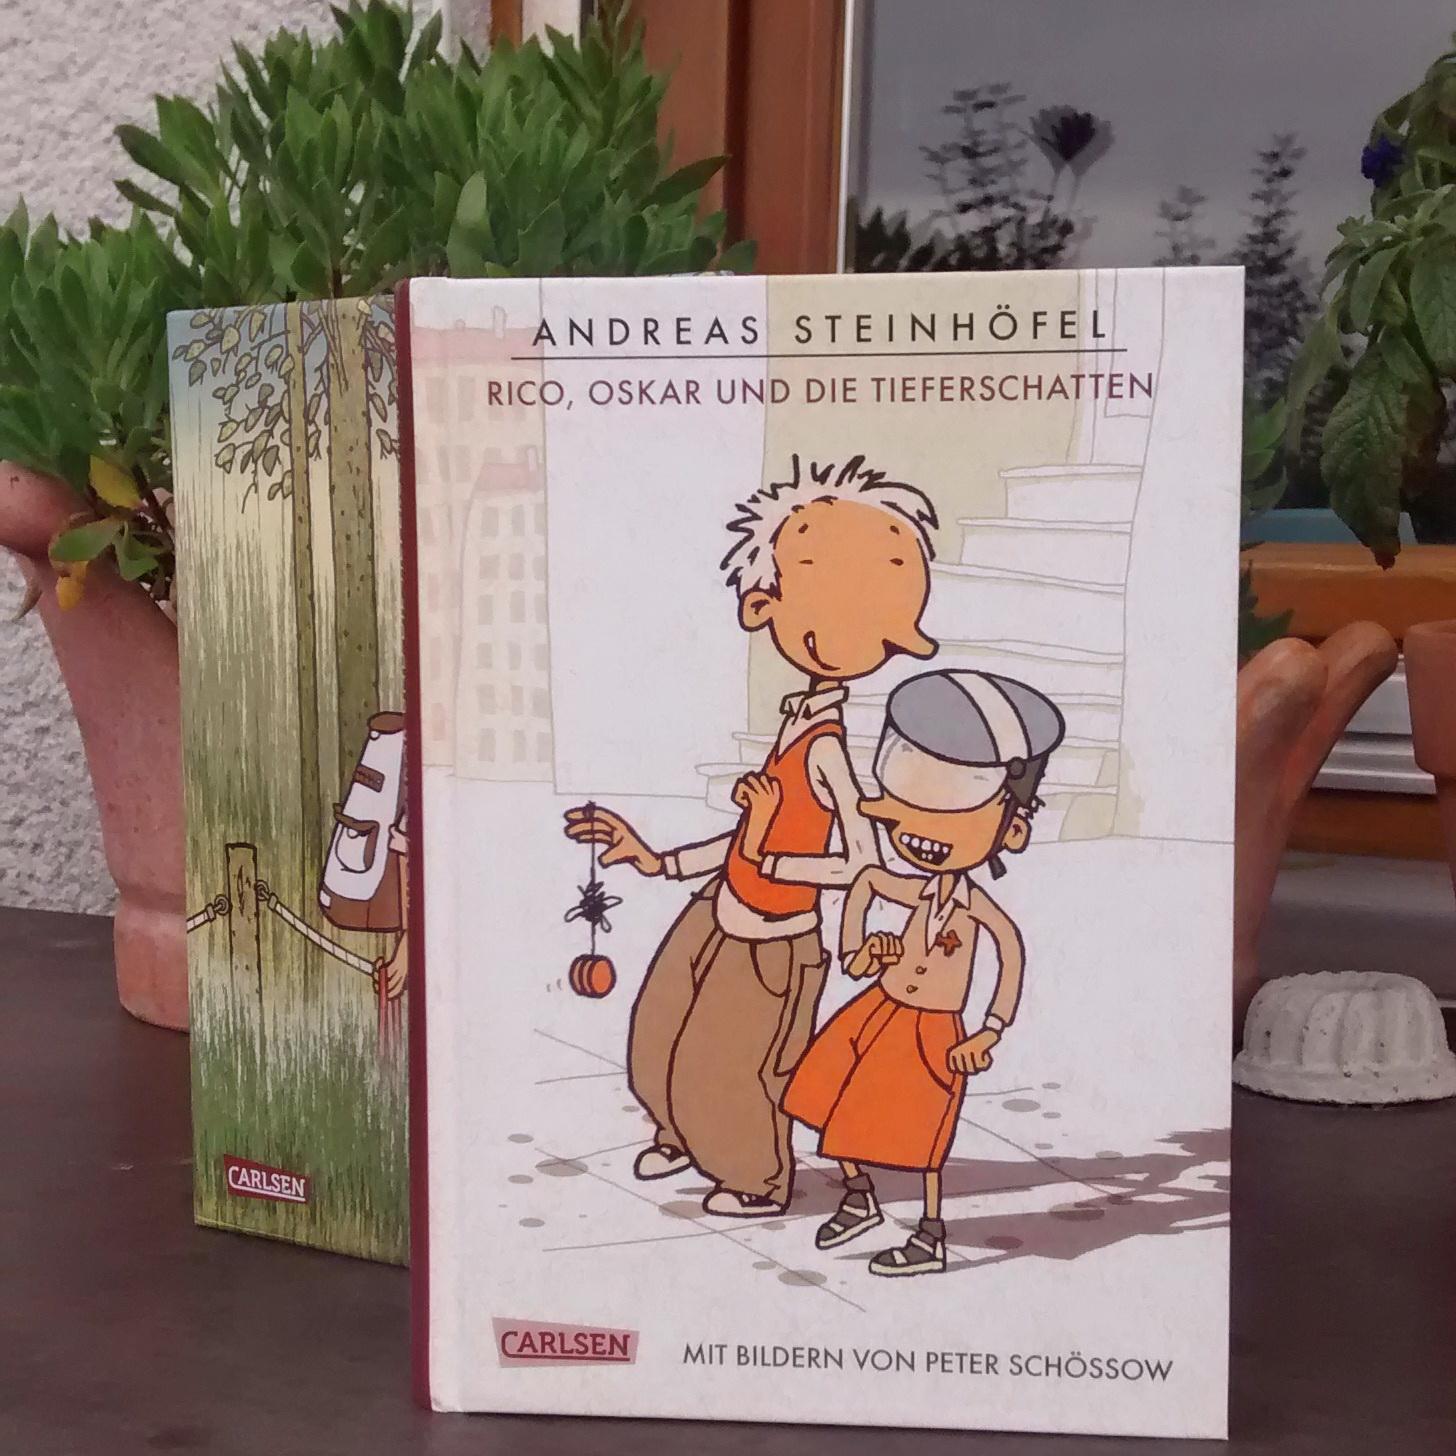 lucciola books andreas steinhöfel  rico oskar und die